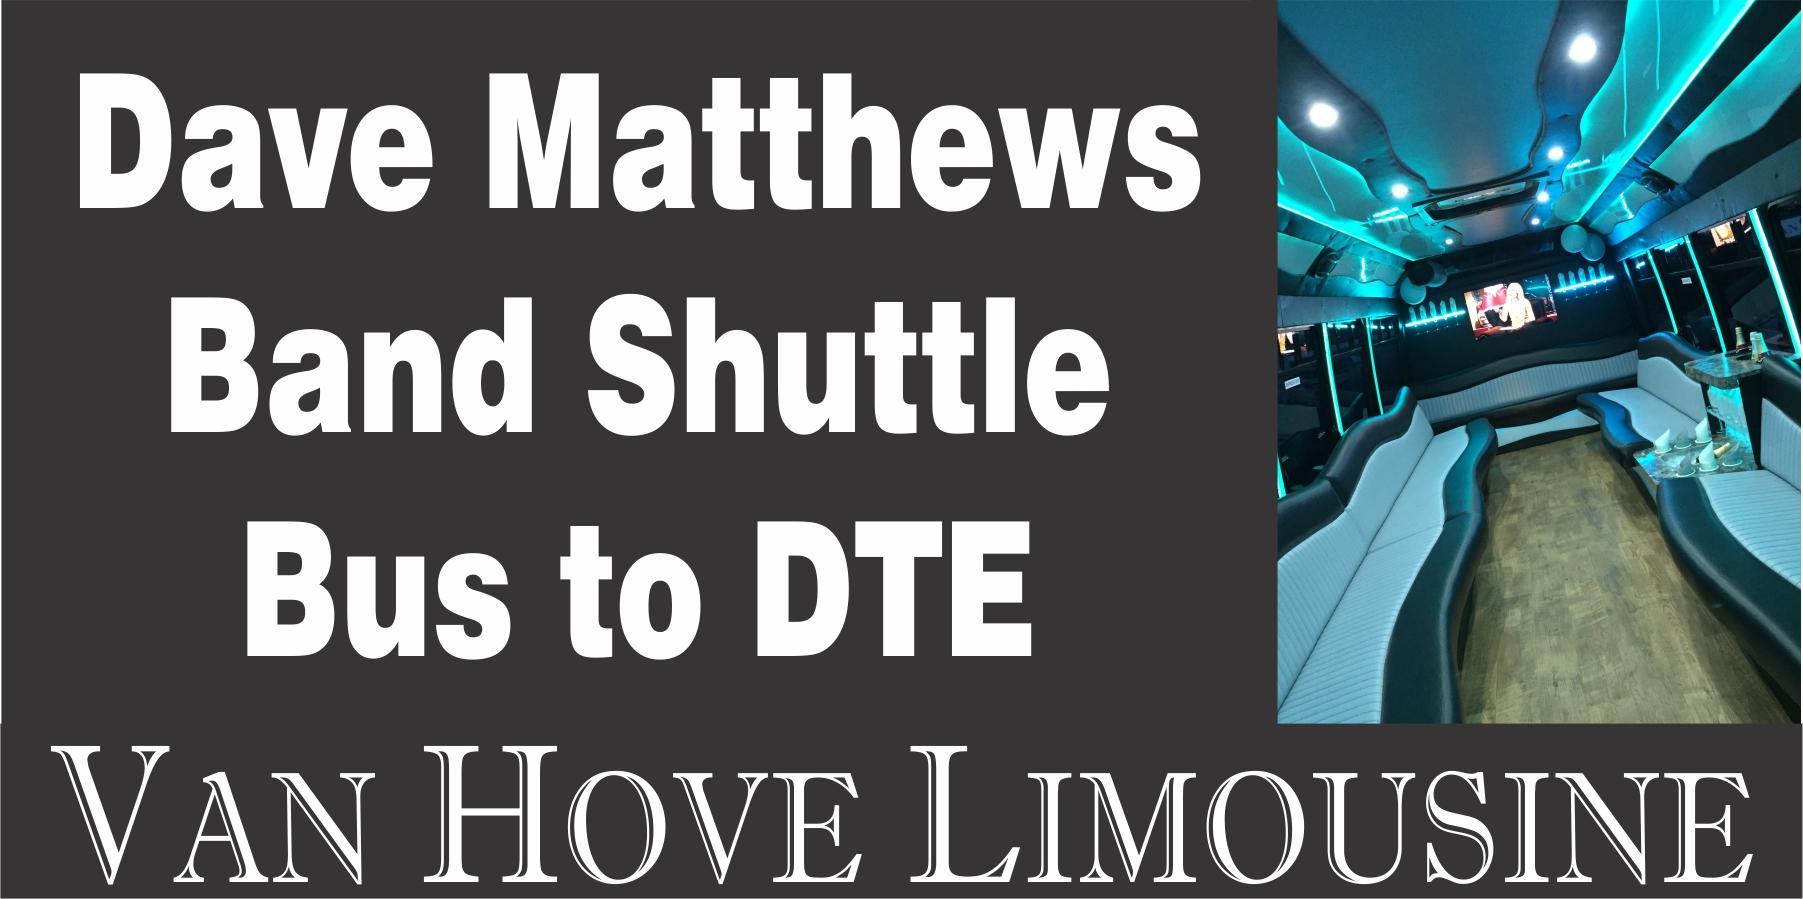 Dave Mathews Band Shuttle Bus to DTE from Hamlin Pub 25 Mile & Van Dyke